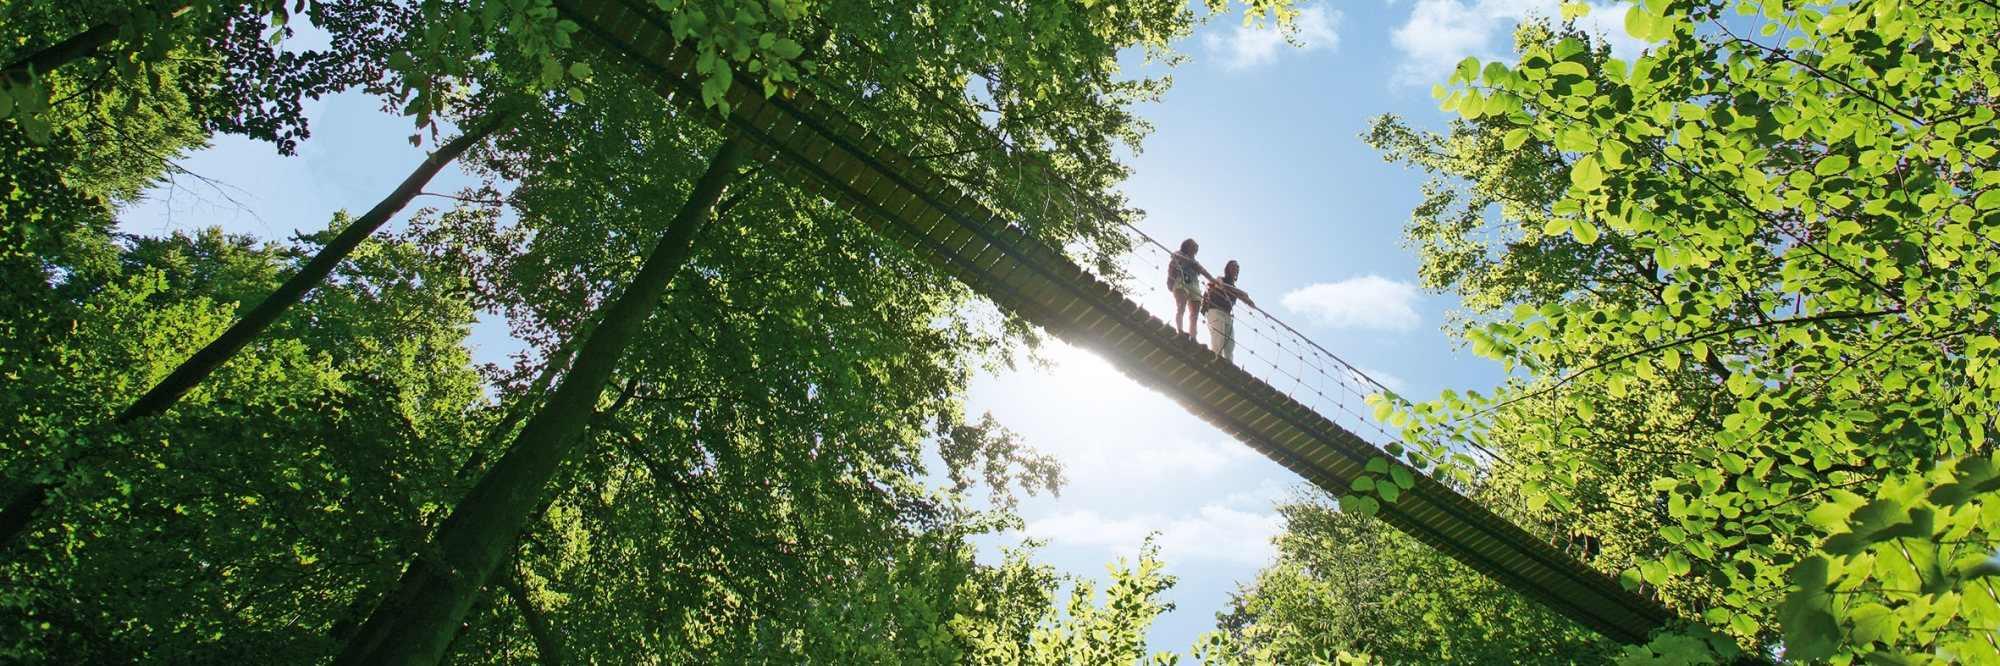 headerfoto ©Rothaarsteigverein-Björn-Hänssler-Hängebrücke-bei-Kühhude